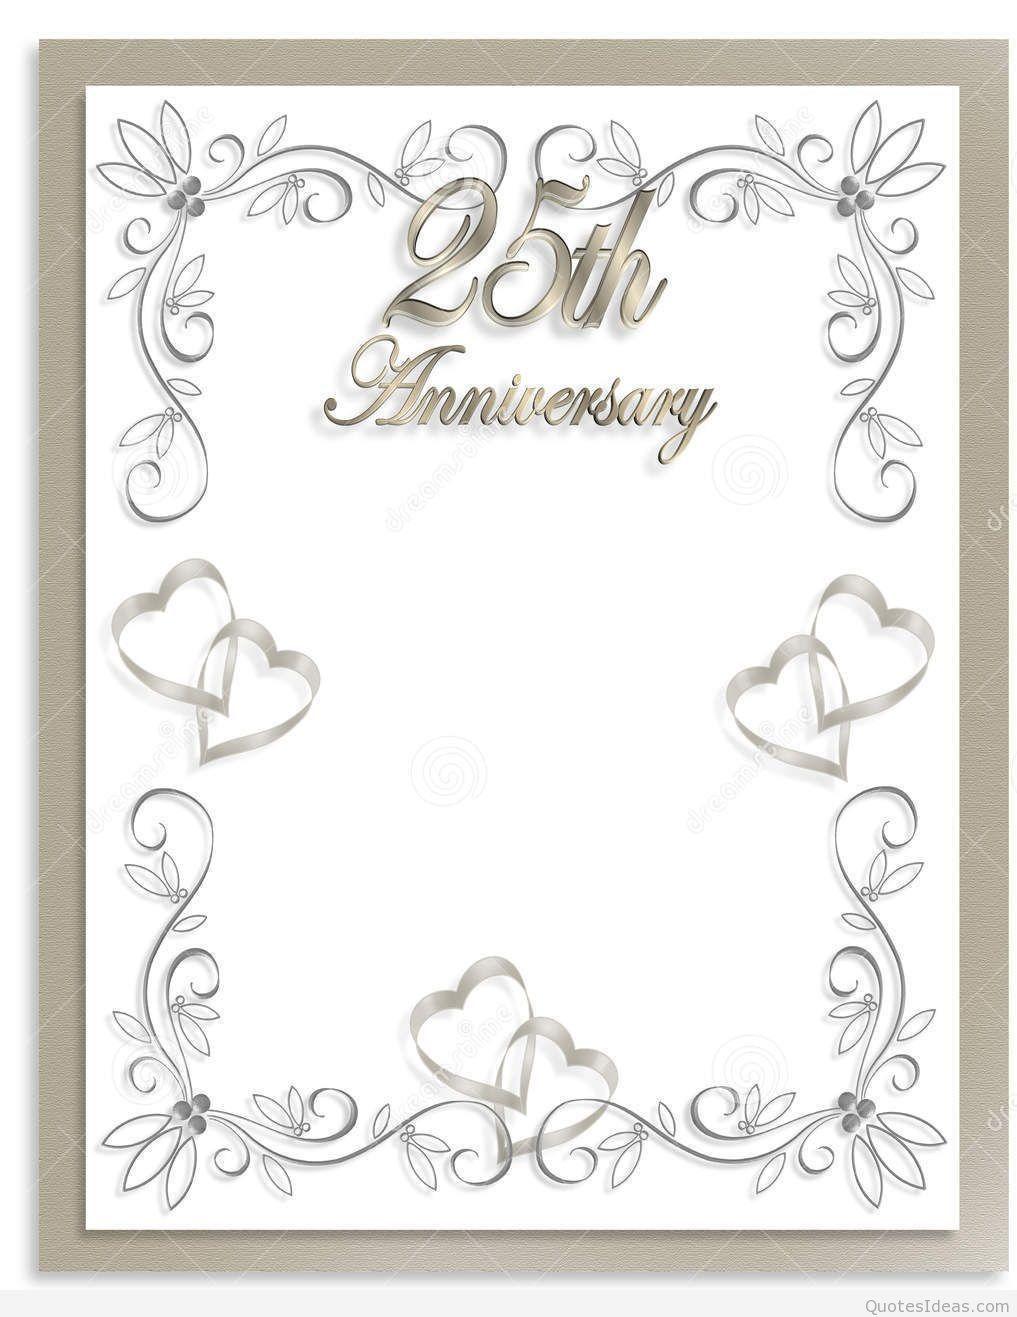 free silver wedding anniversary